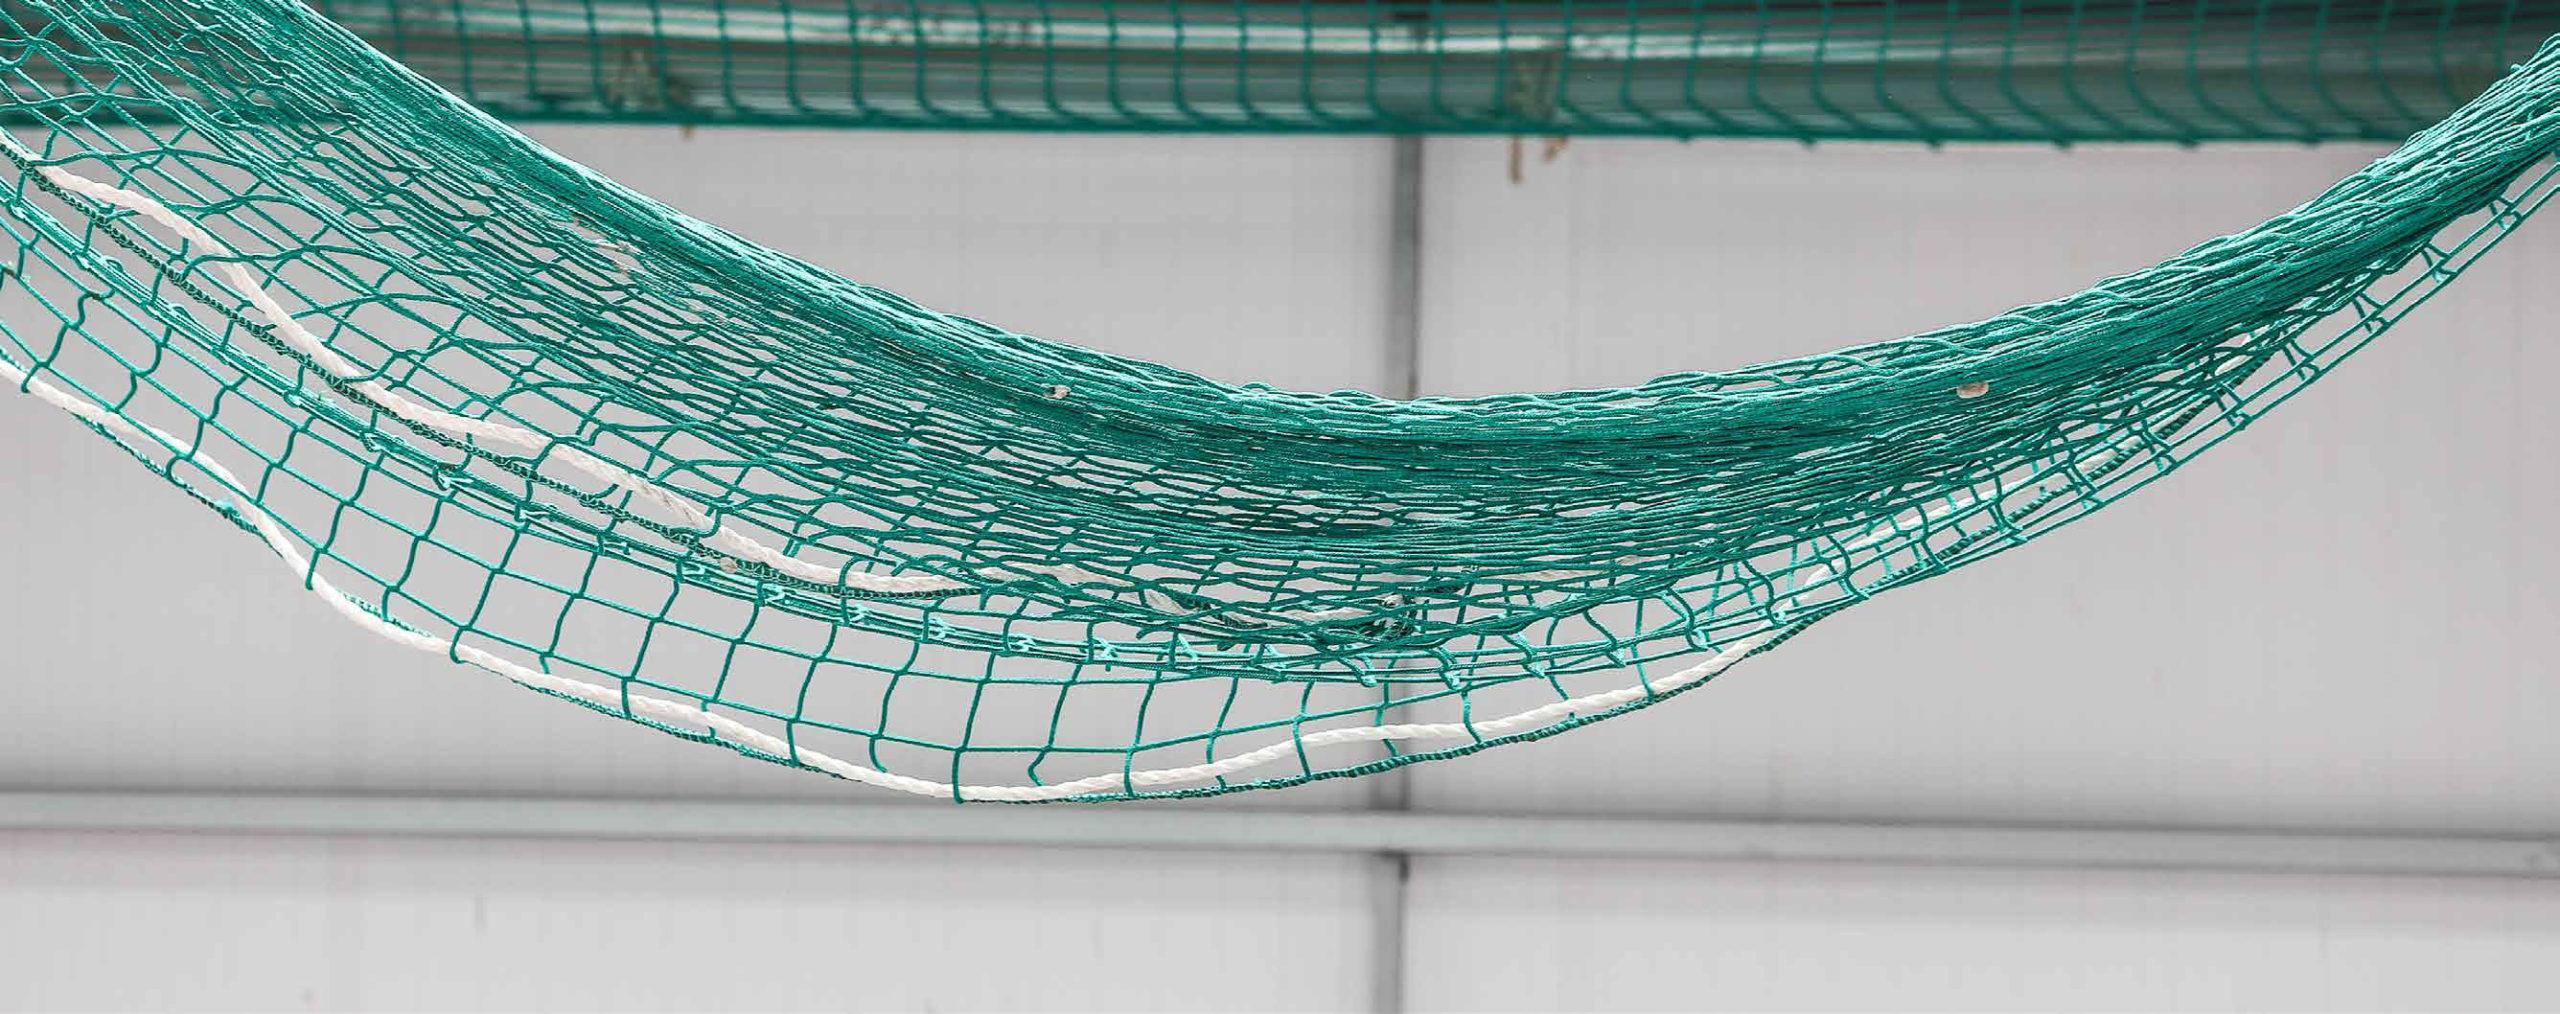 safety netting